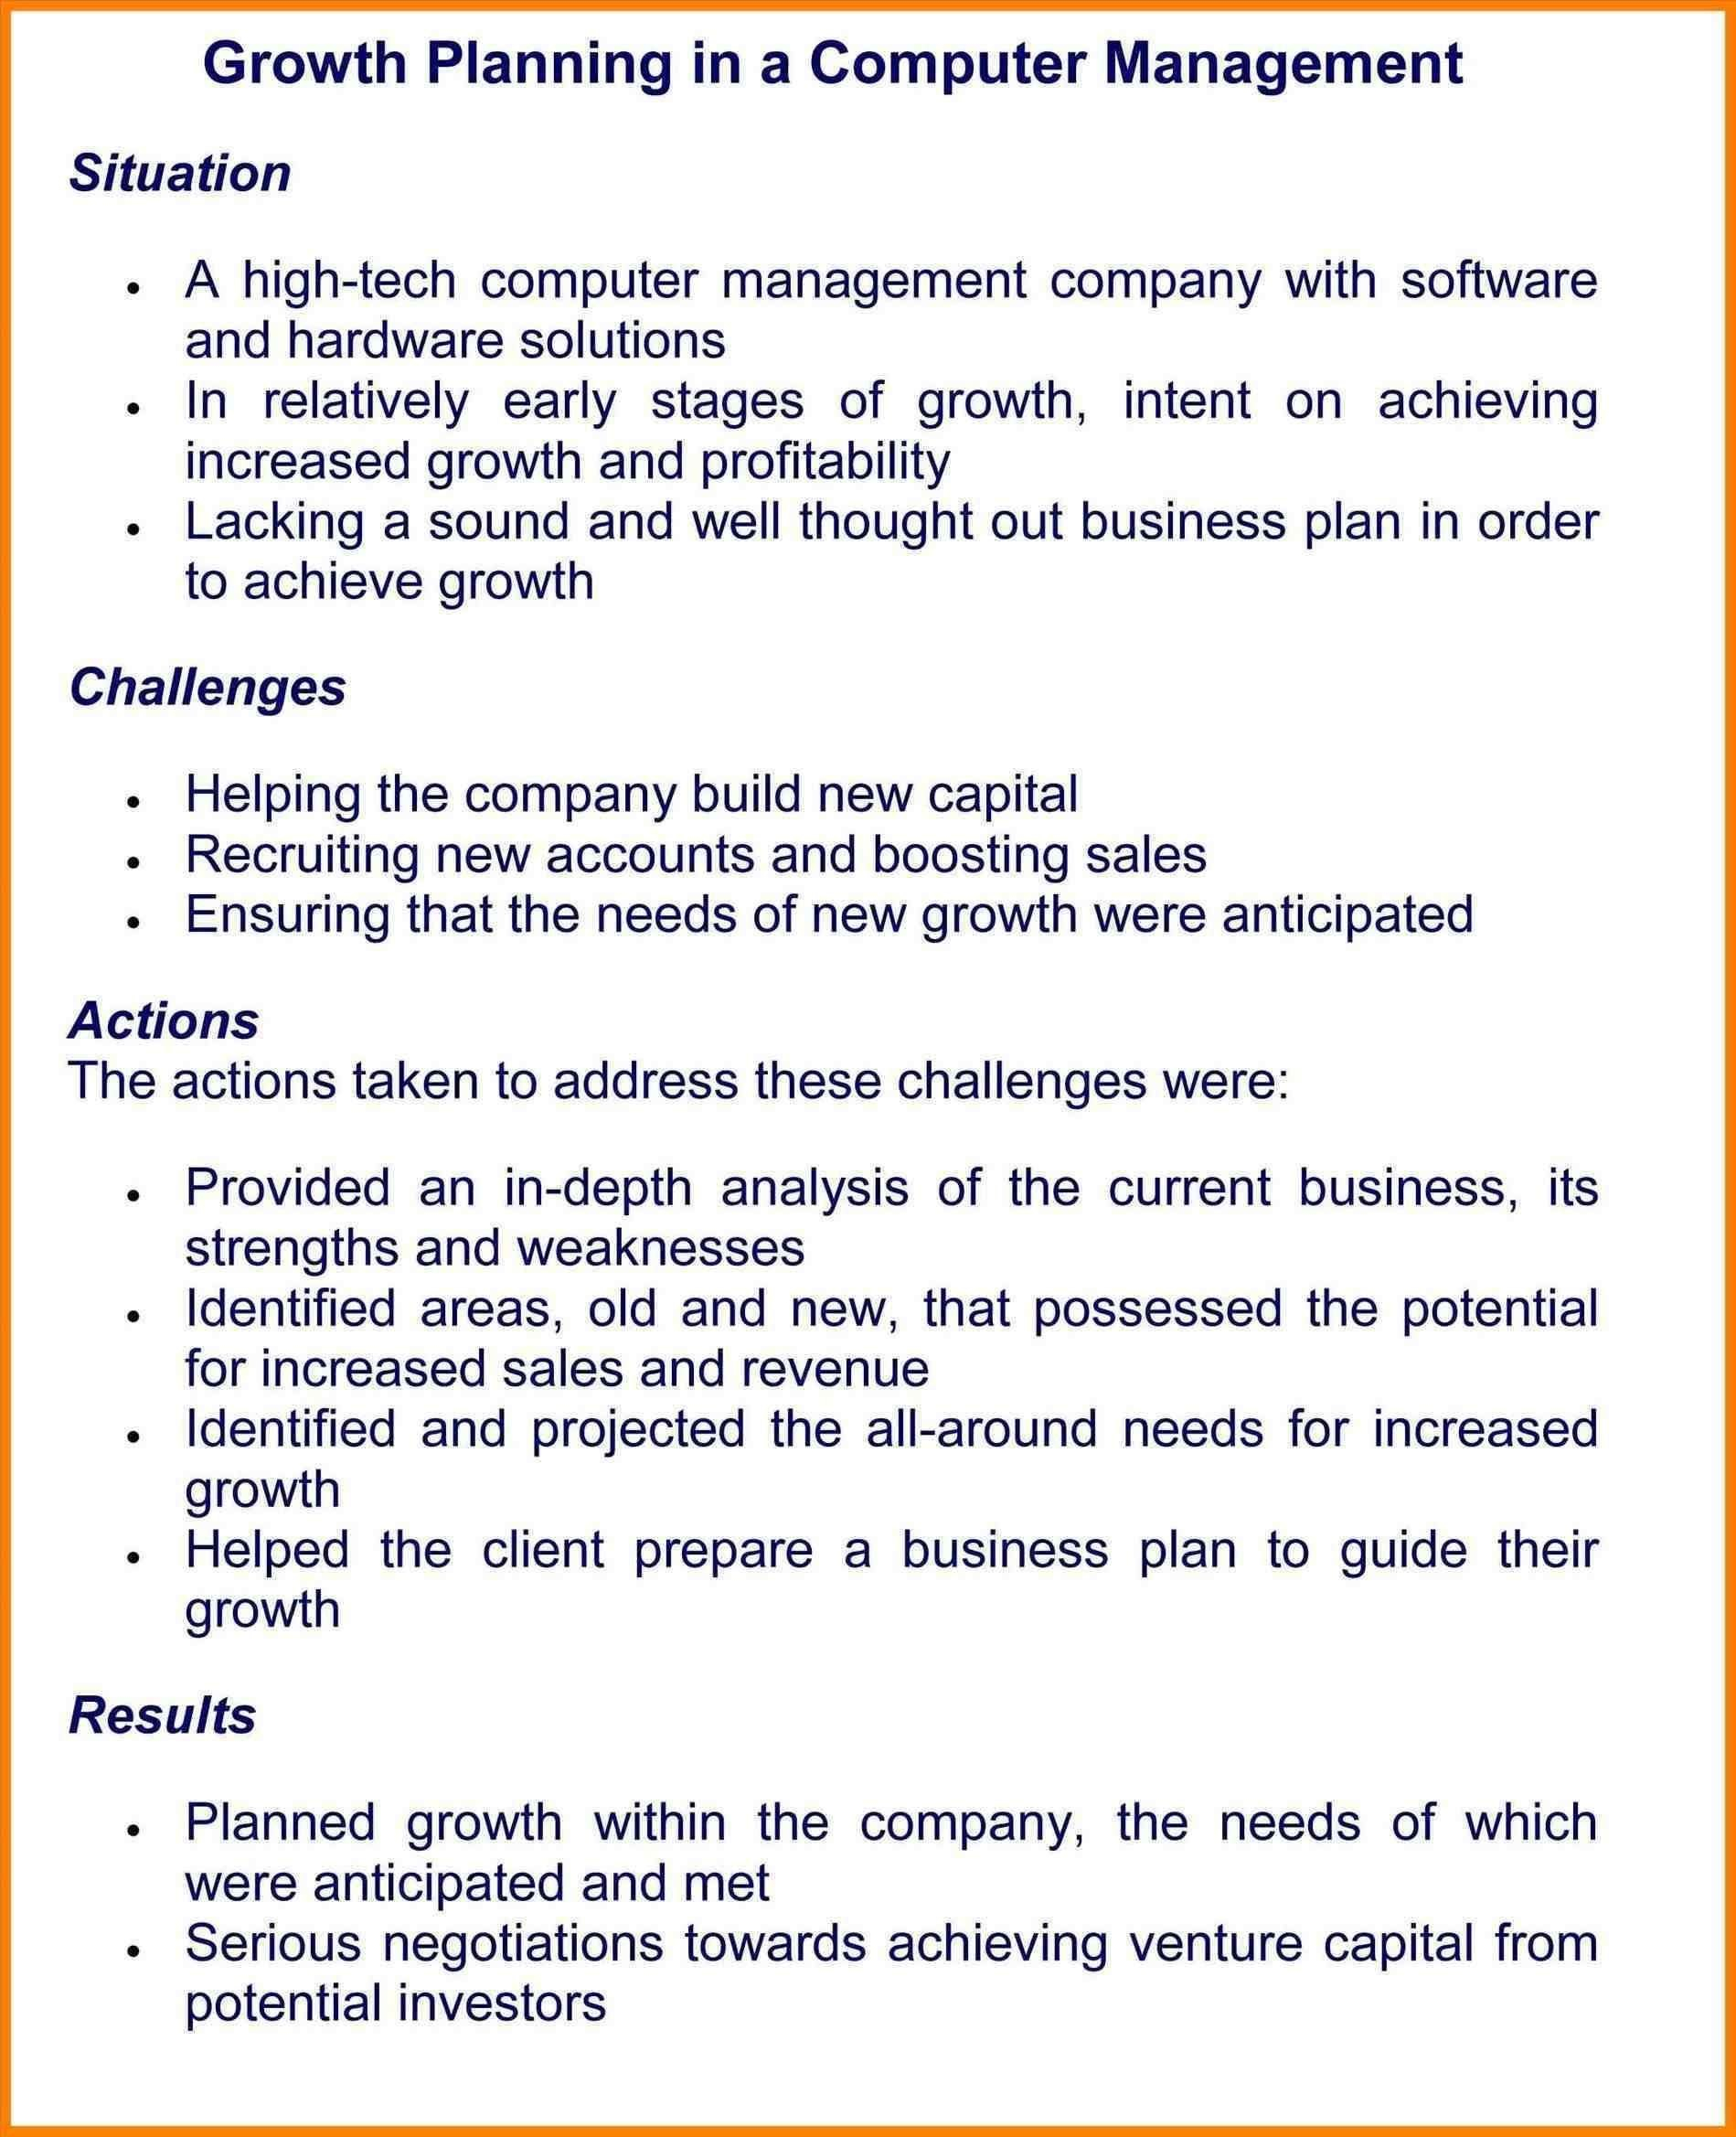 Free Hvac Business Plan Template  Caquetapositivo For Free Hvac Business Plan Template